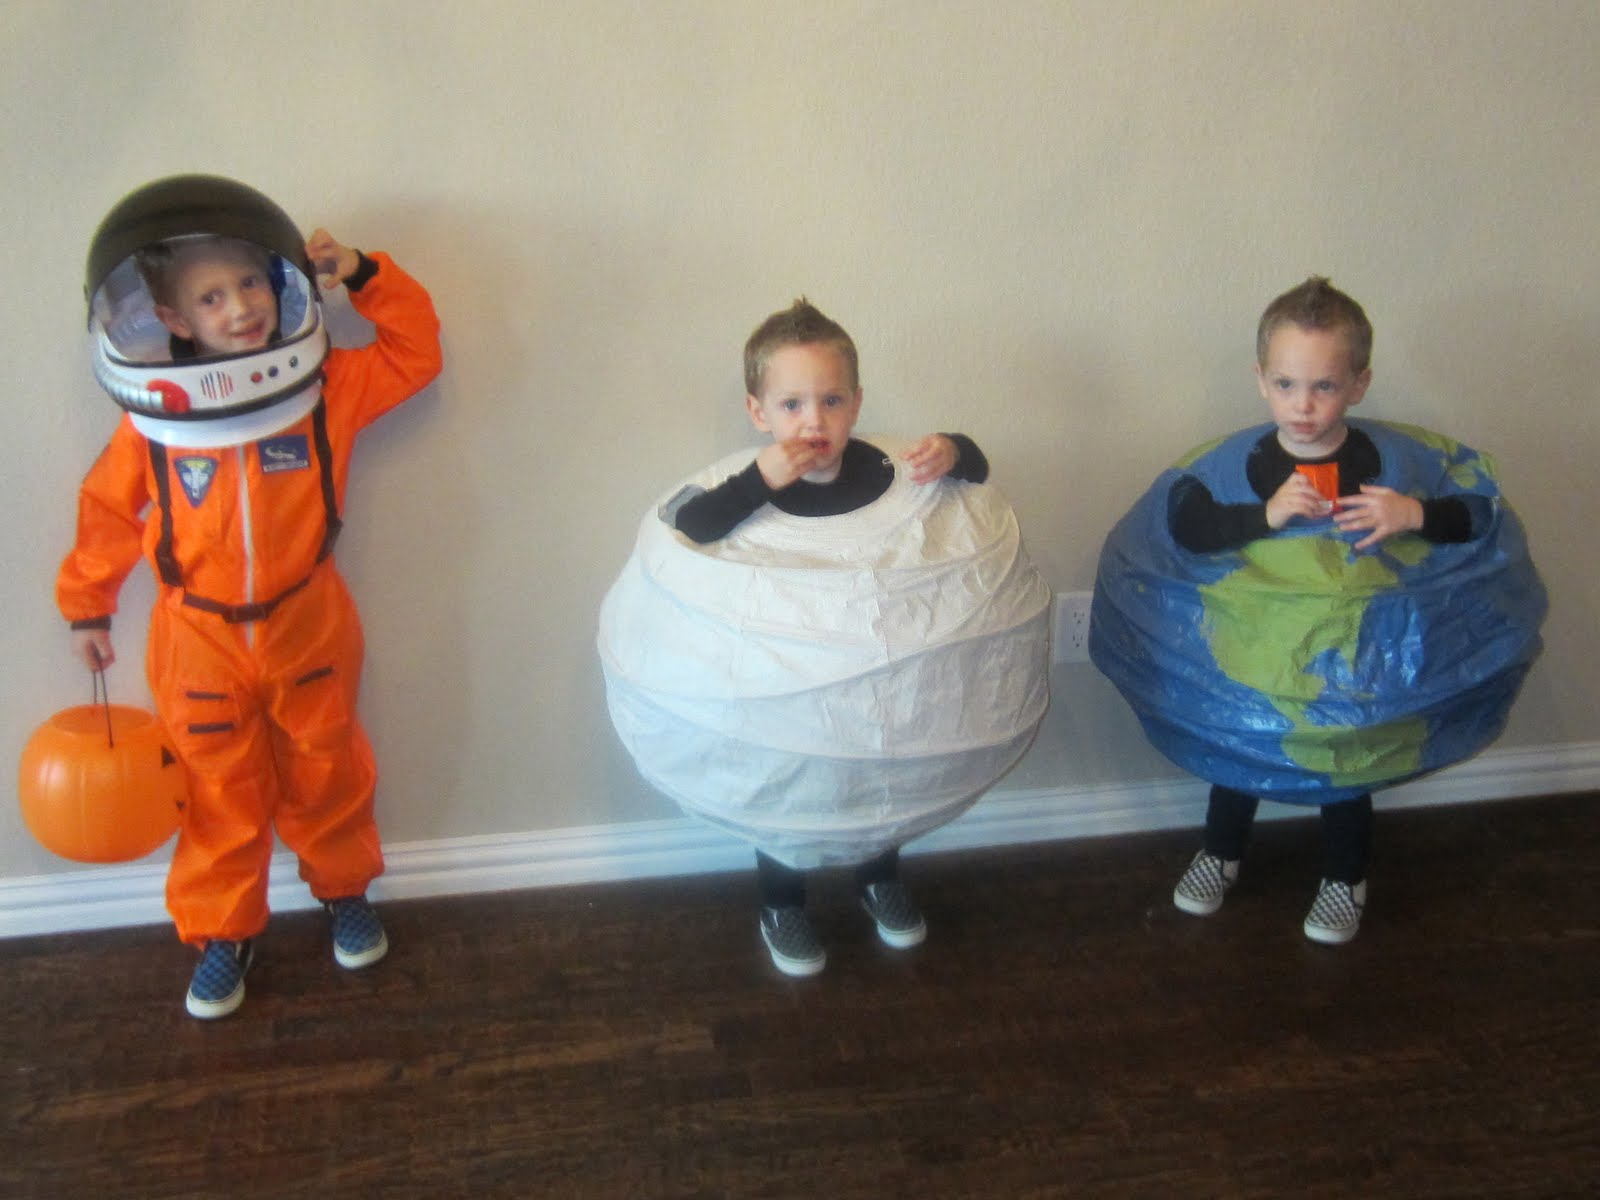 planet mars costume - photo #2